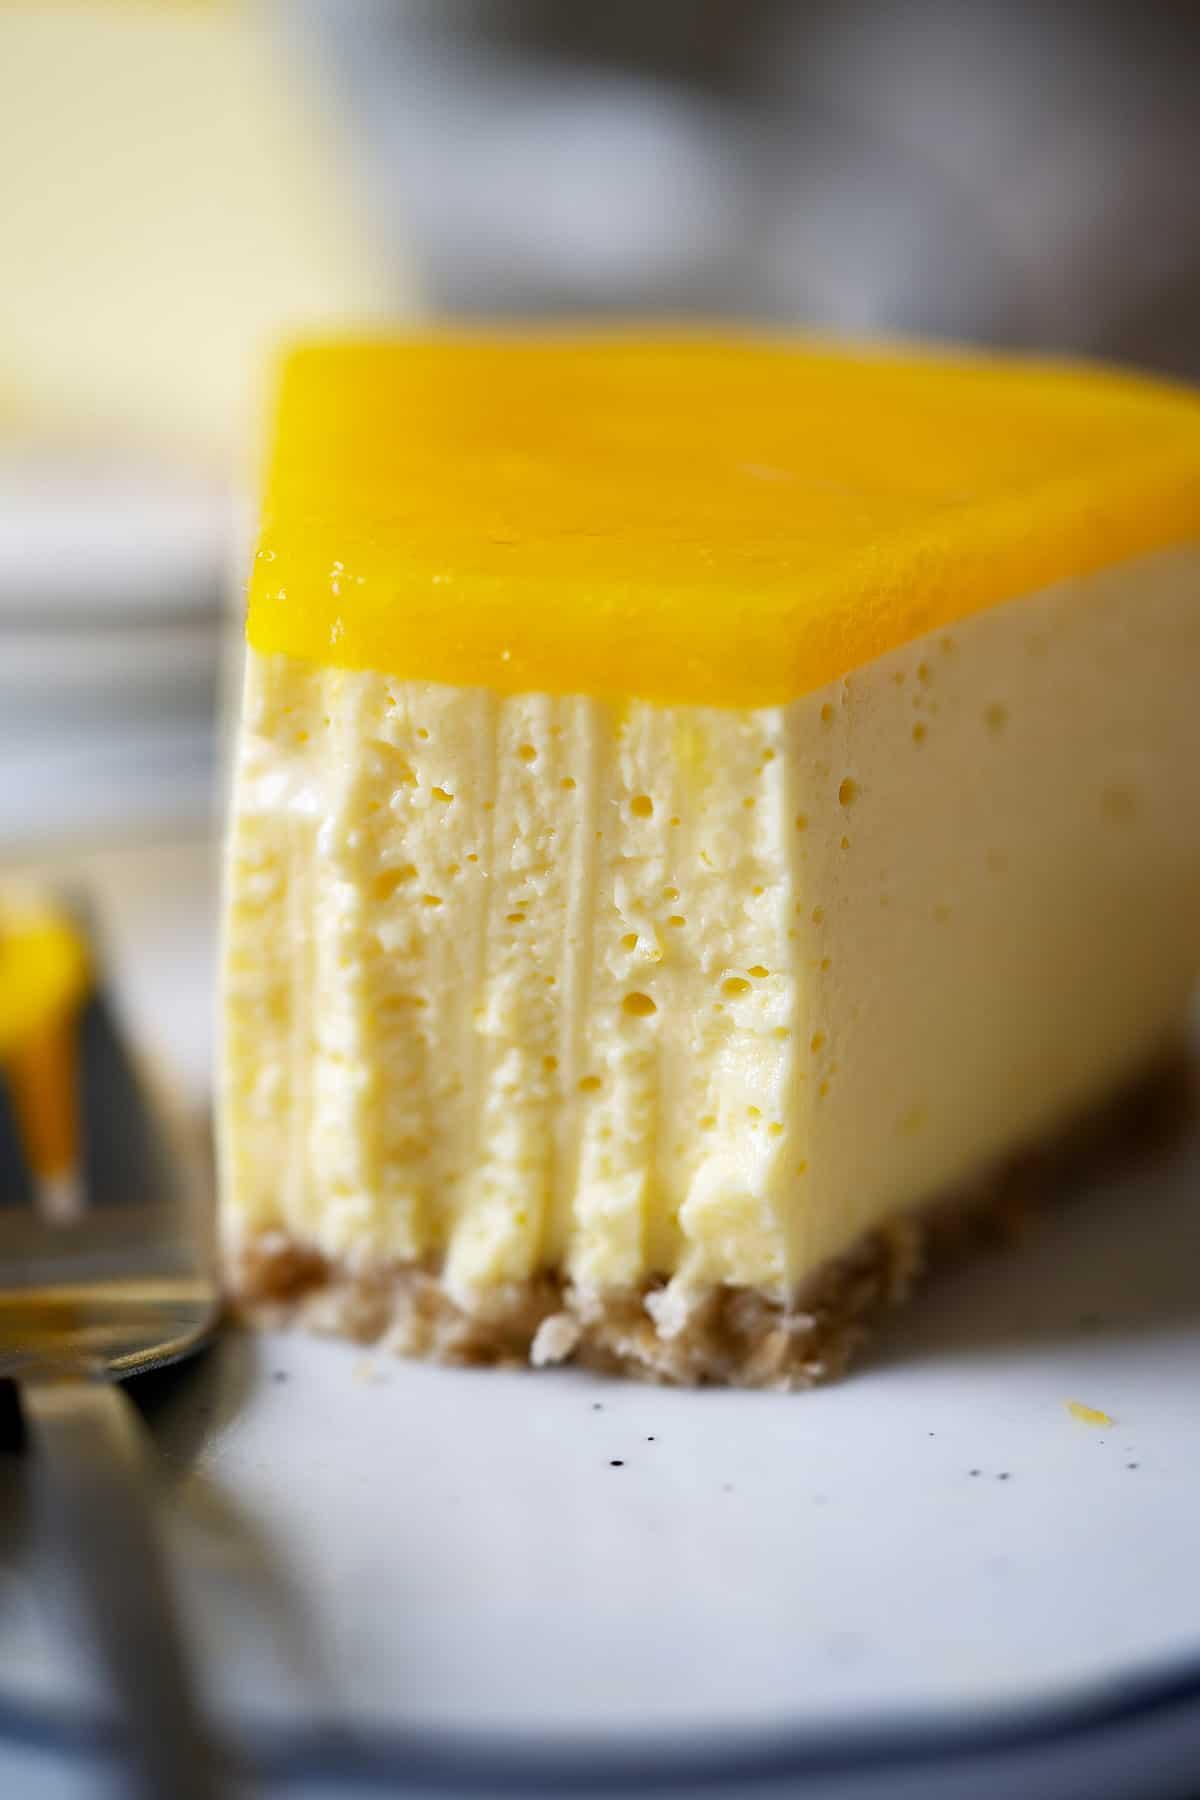 Half eaten of a slice of healthy no bake mango cheesecake